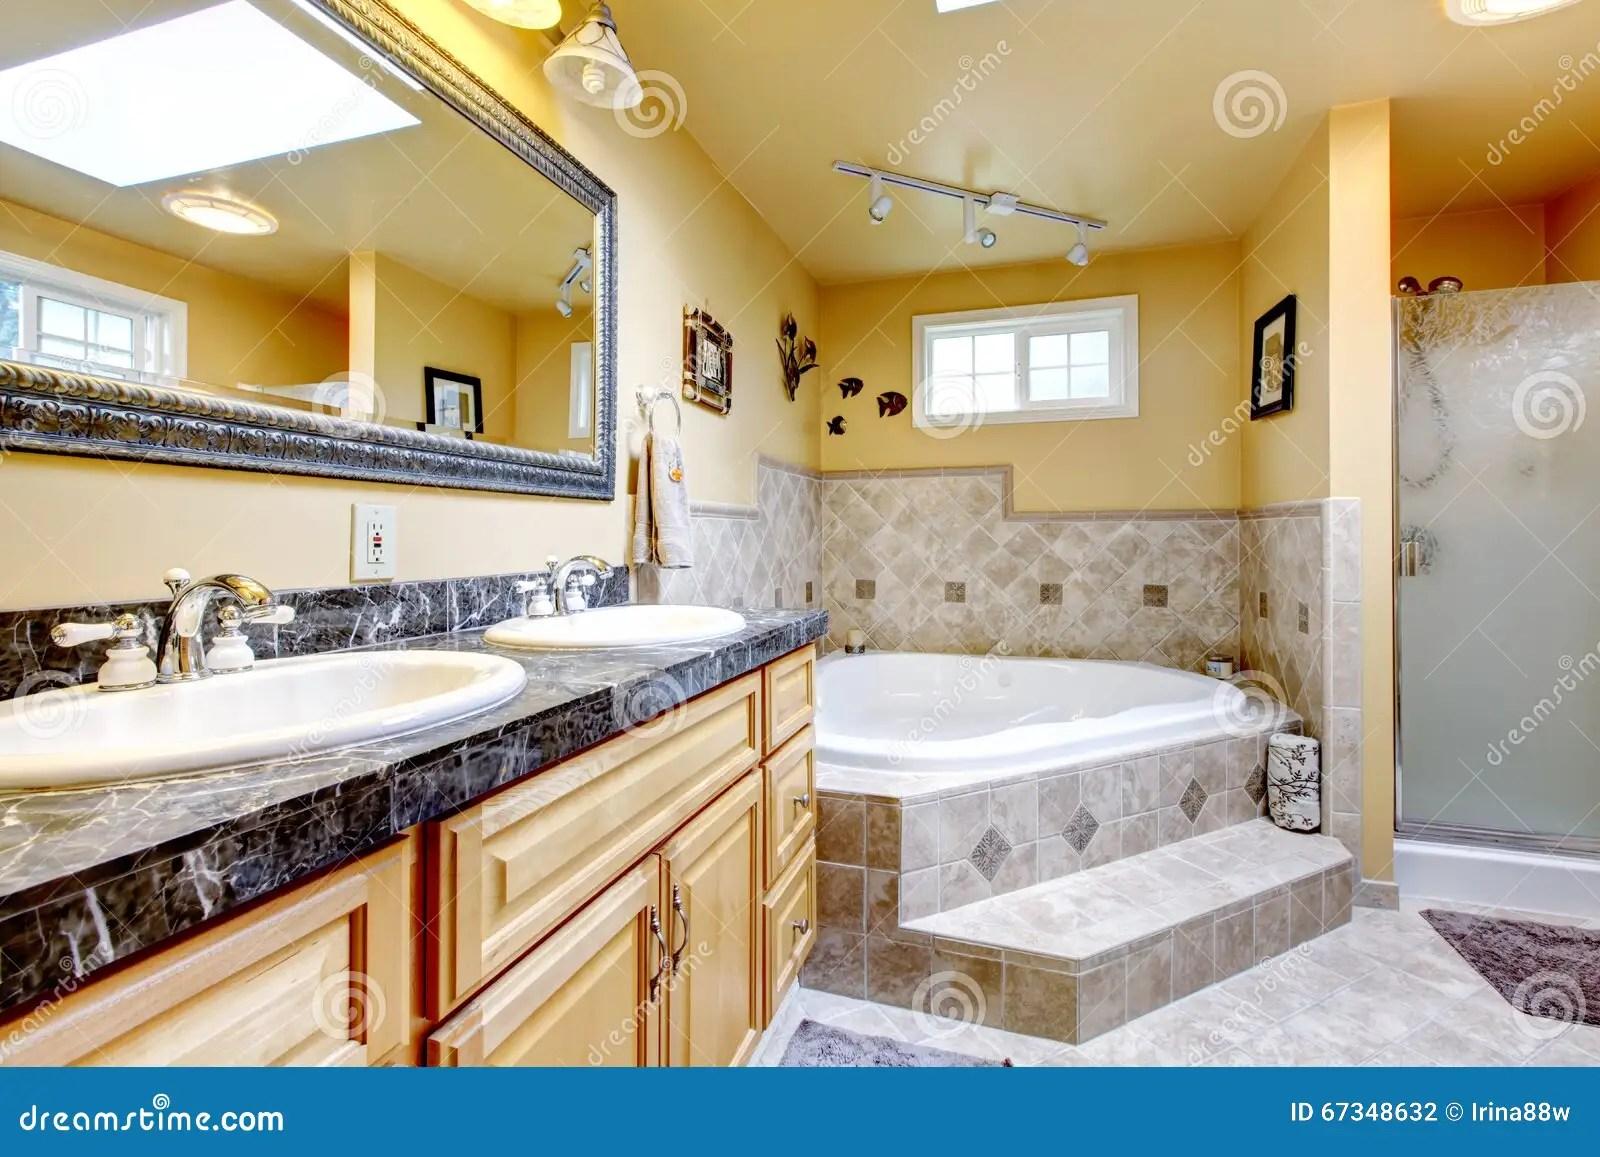 Luxury Bathroom With Jacuzzi Style Bath Tub Stone Floor